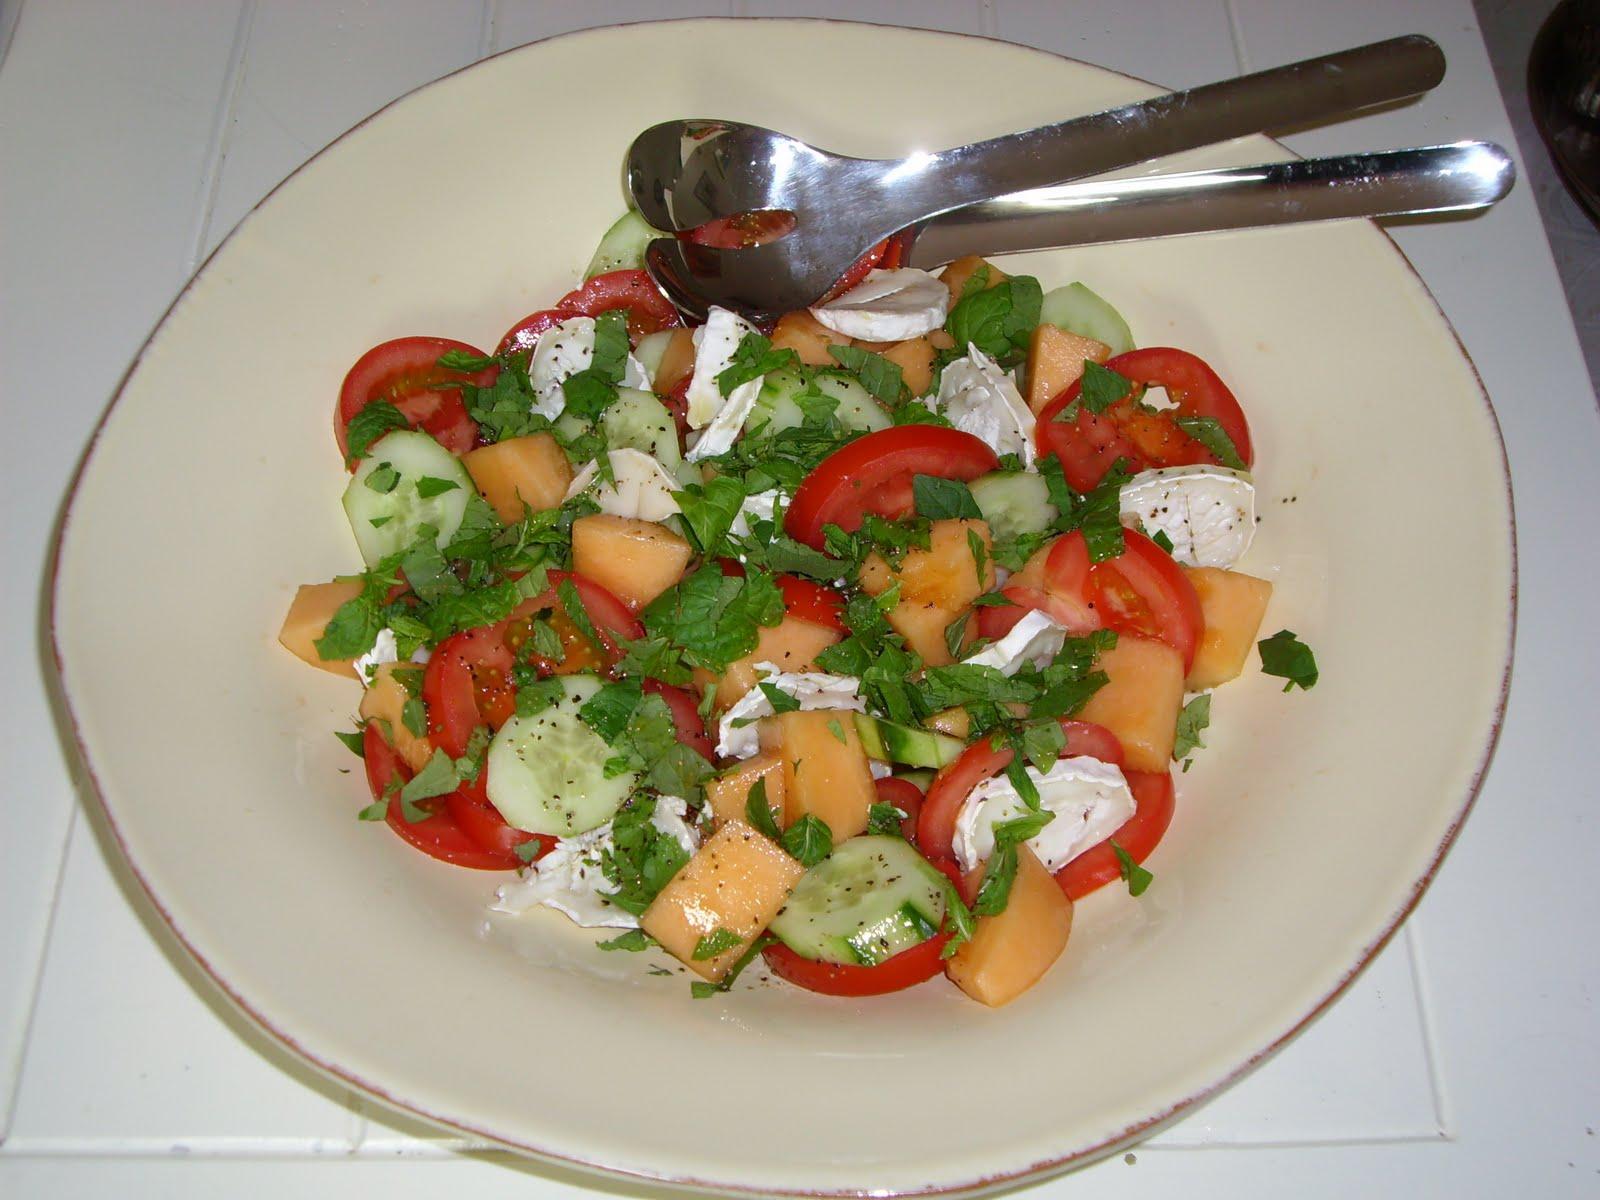 Bentes Matblogg: Sommersalat med melon og agurk